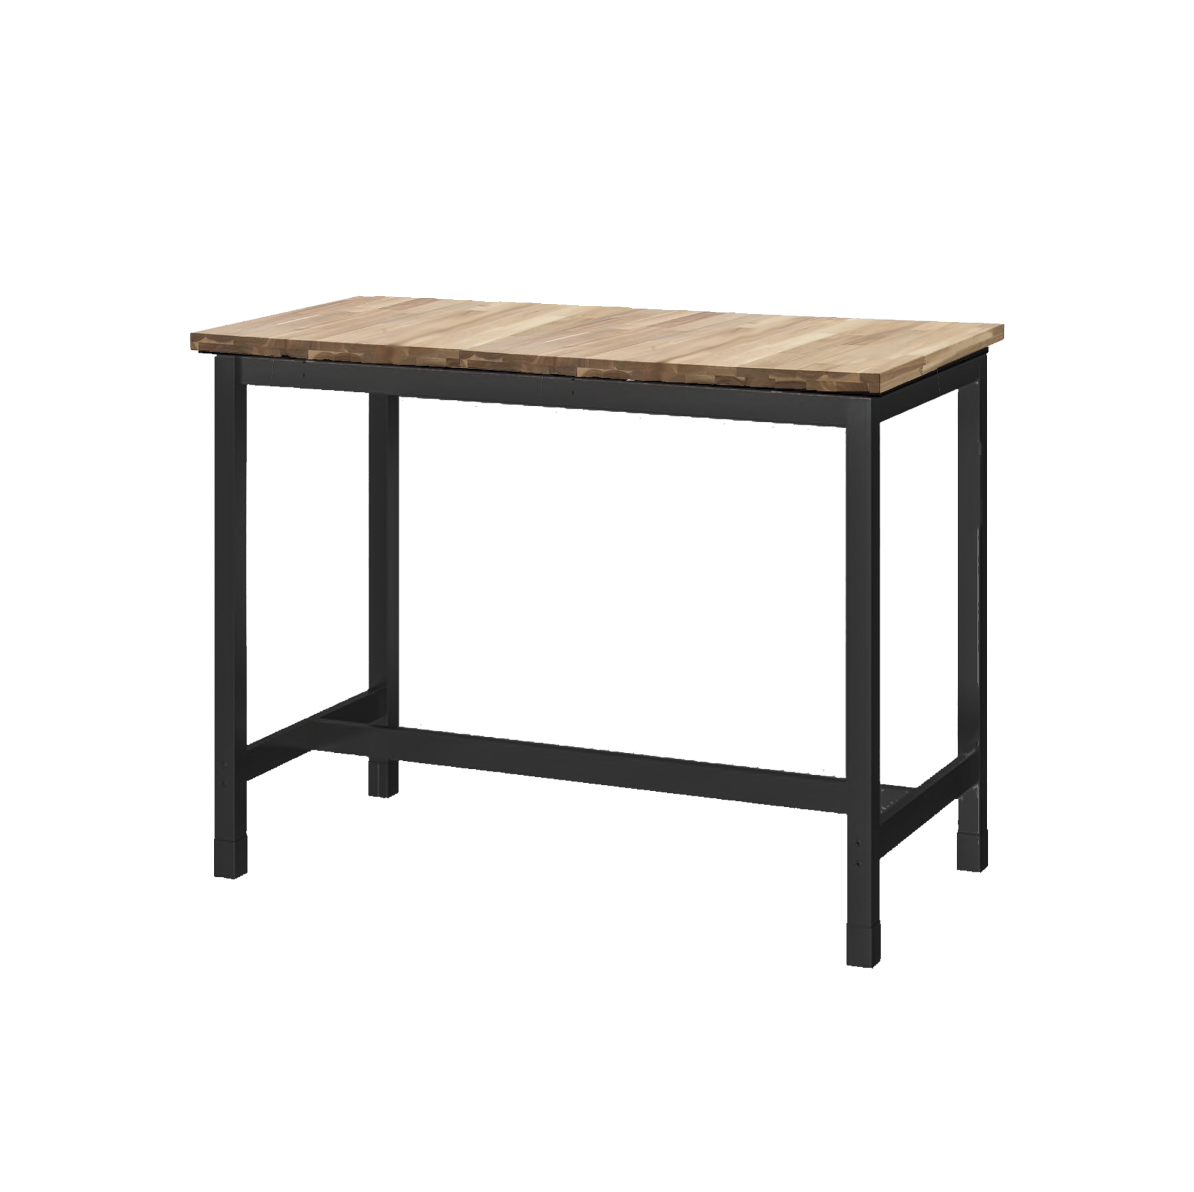 Wood Urban Communal Table  $100